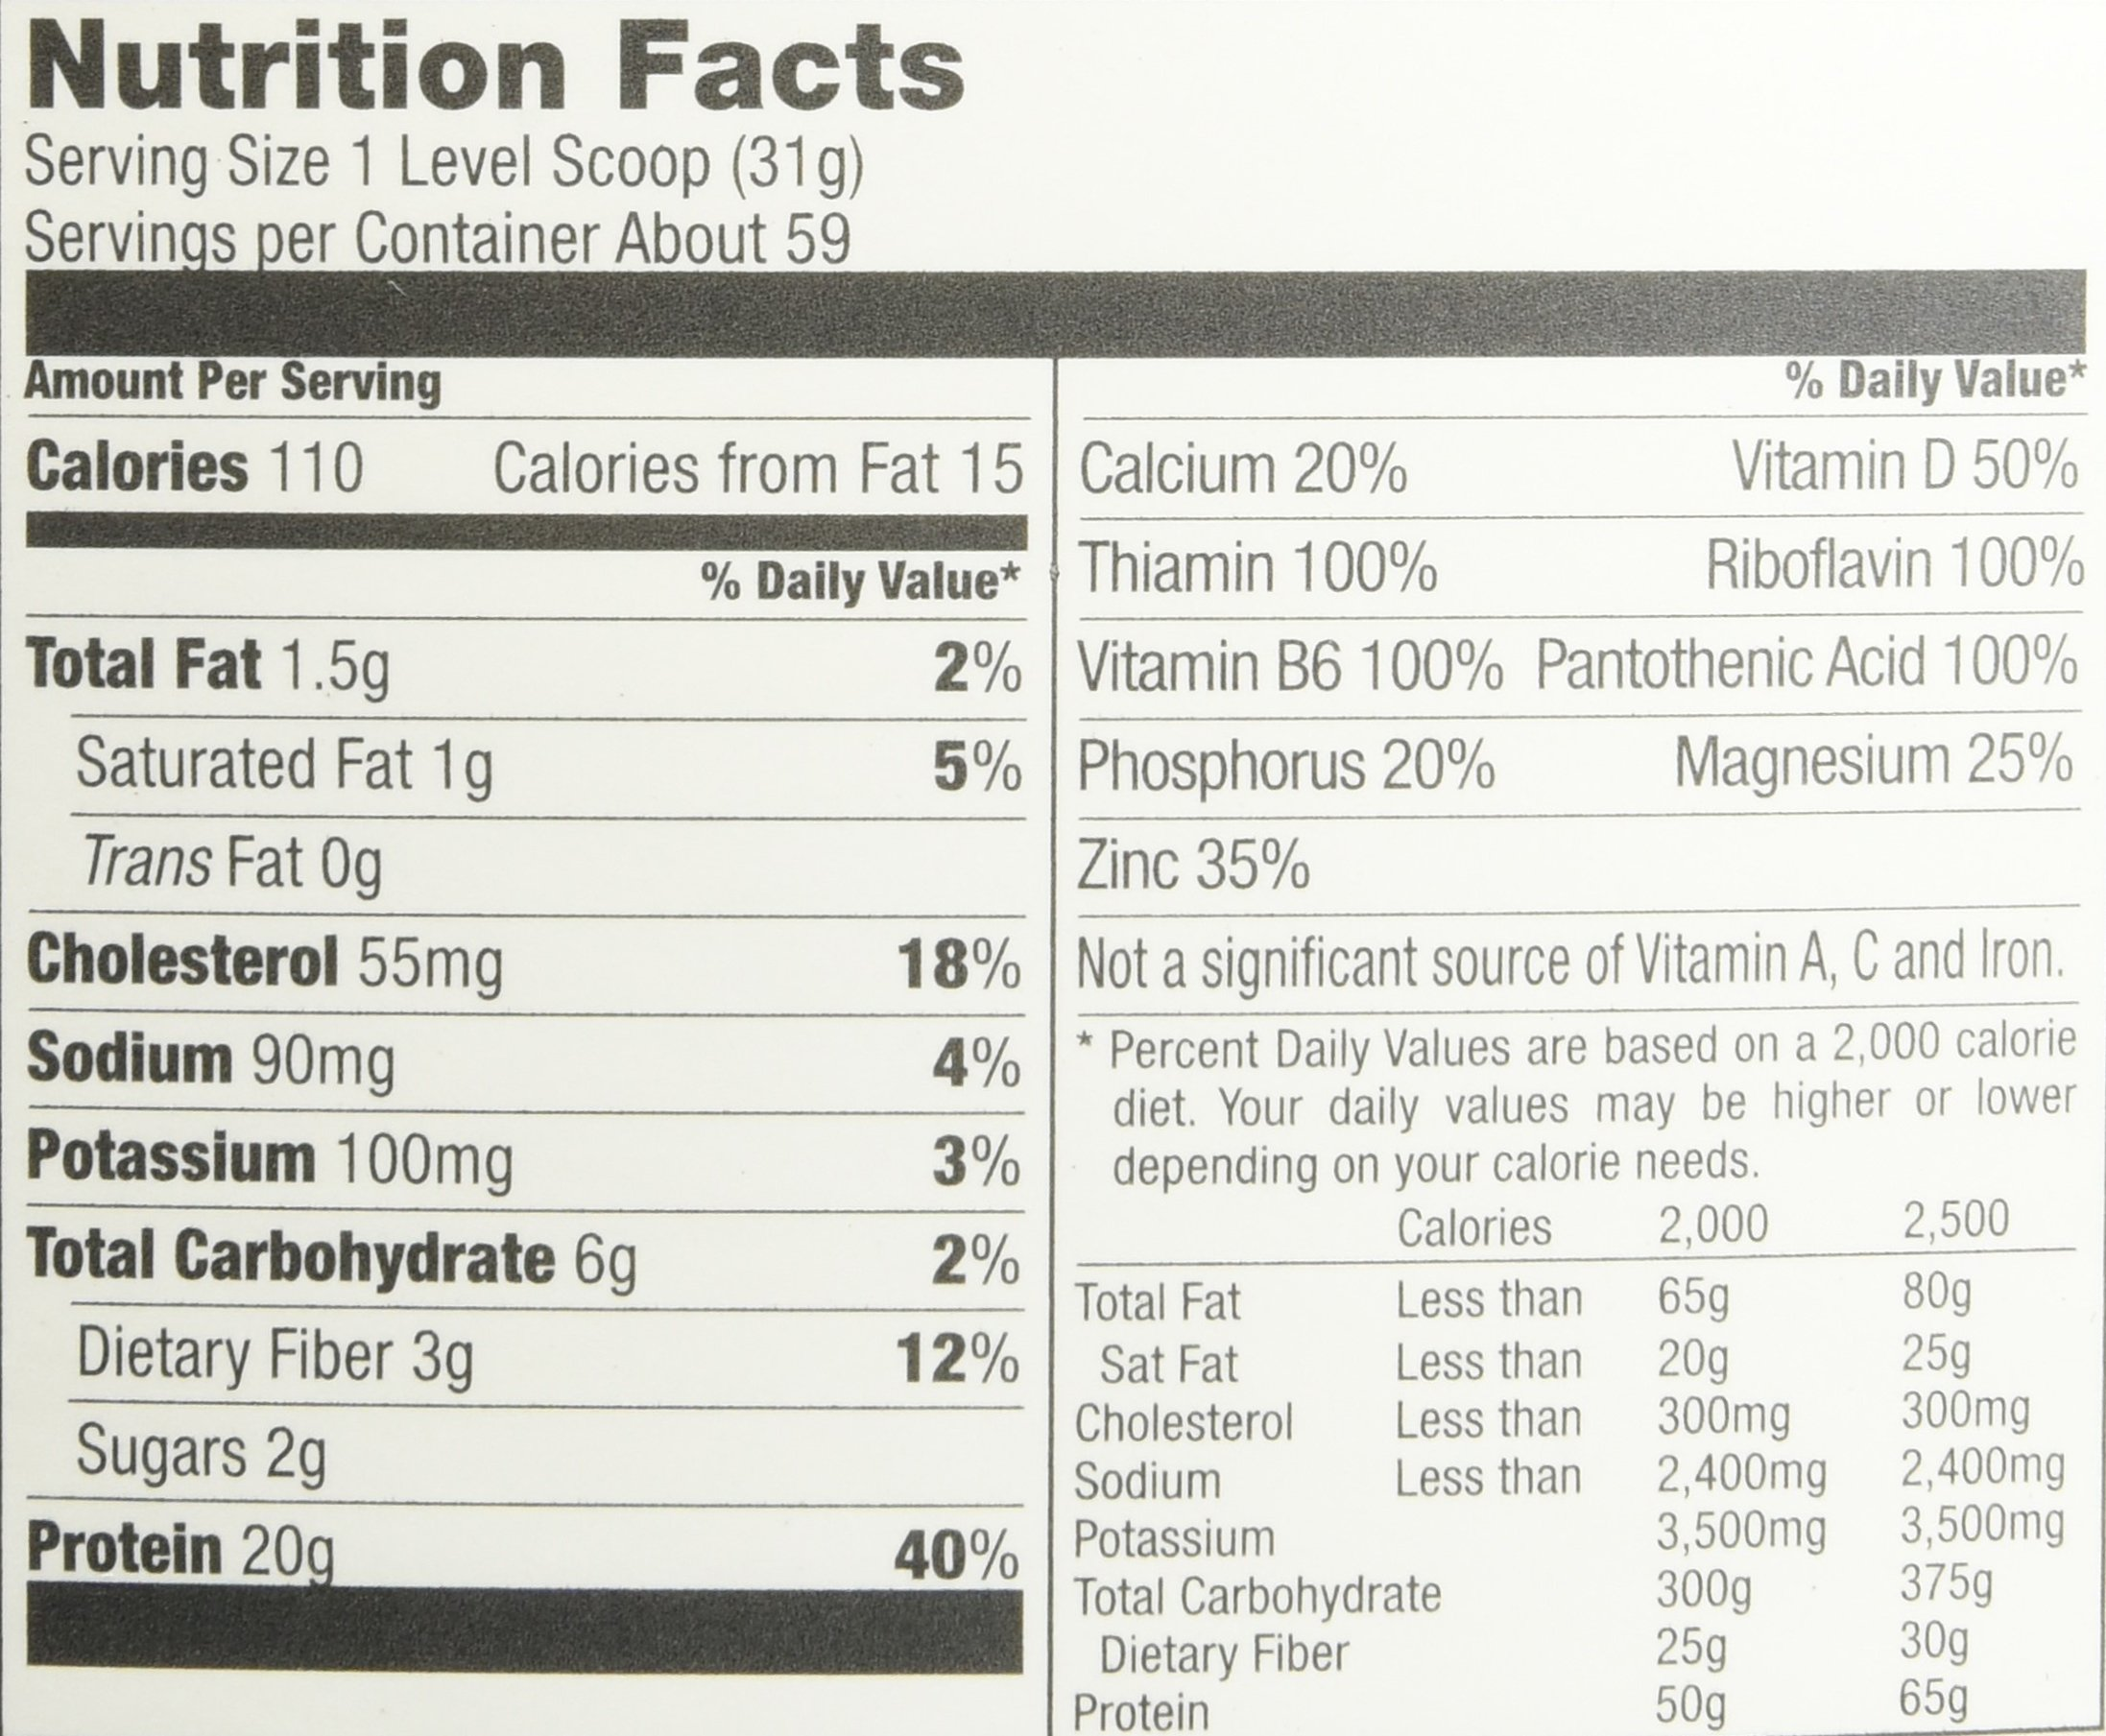 Designer Whey Premium Natural 100% Whey Protein, French Vanilla, 4 Pound by Designer Whey (Image #1)